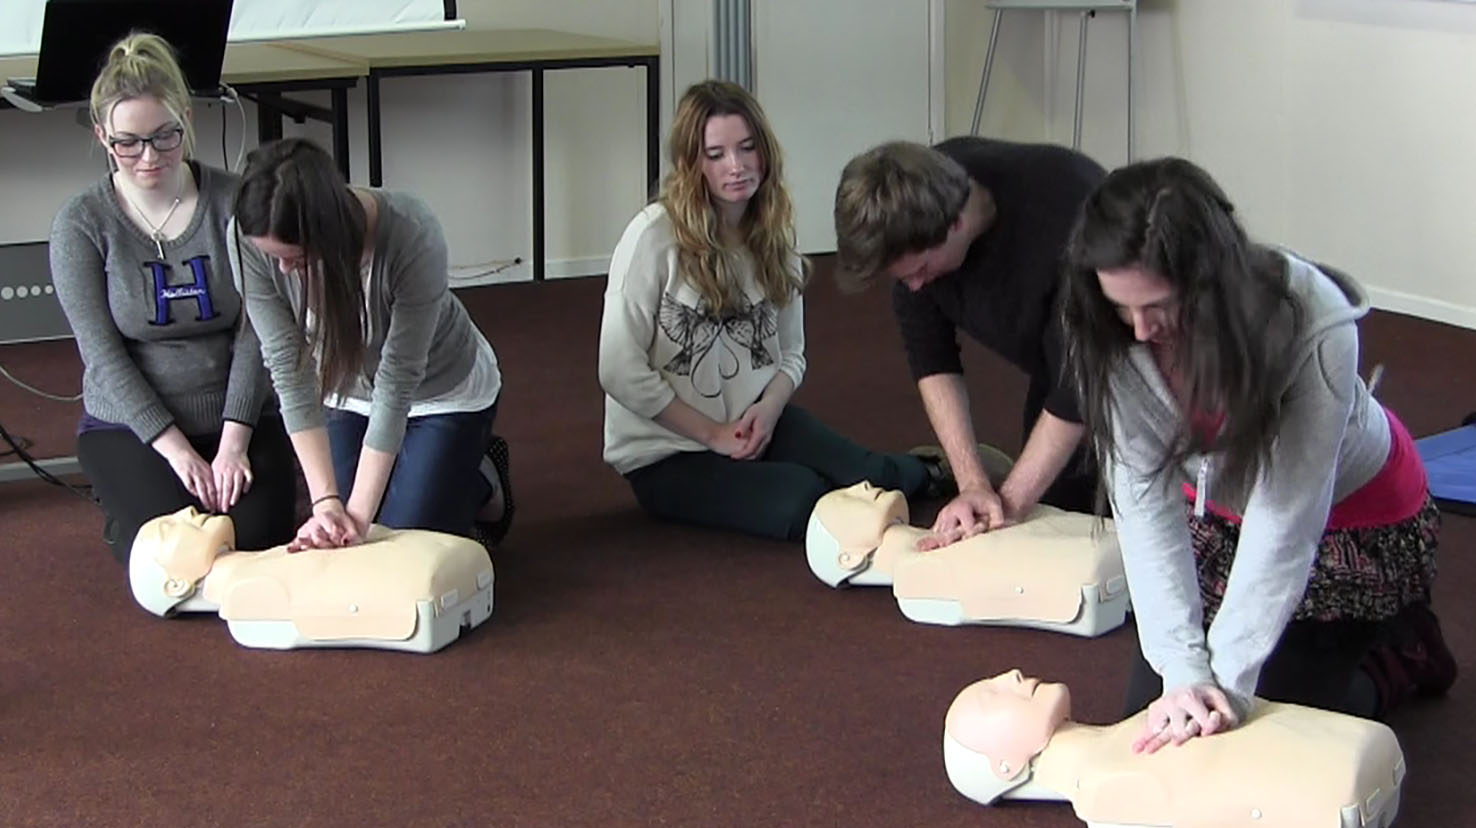 63a3e5ba9e Is Your Resuscitation Training Up To Standard?